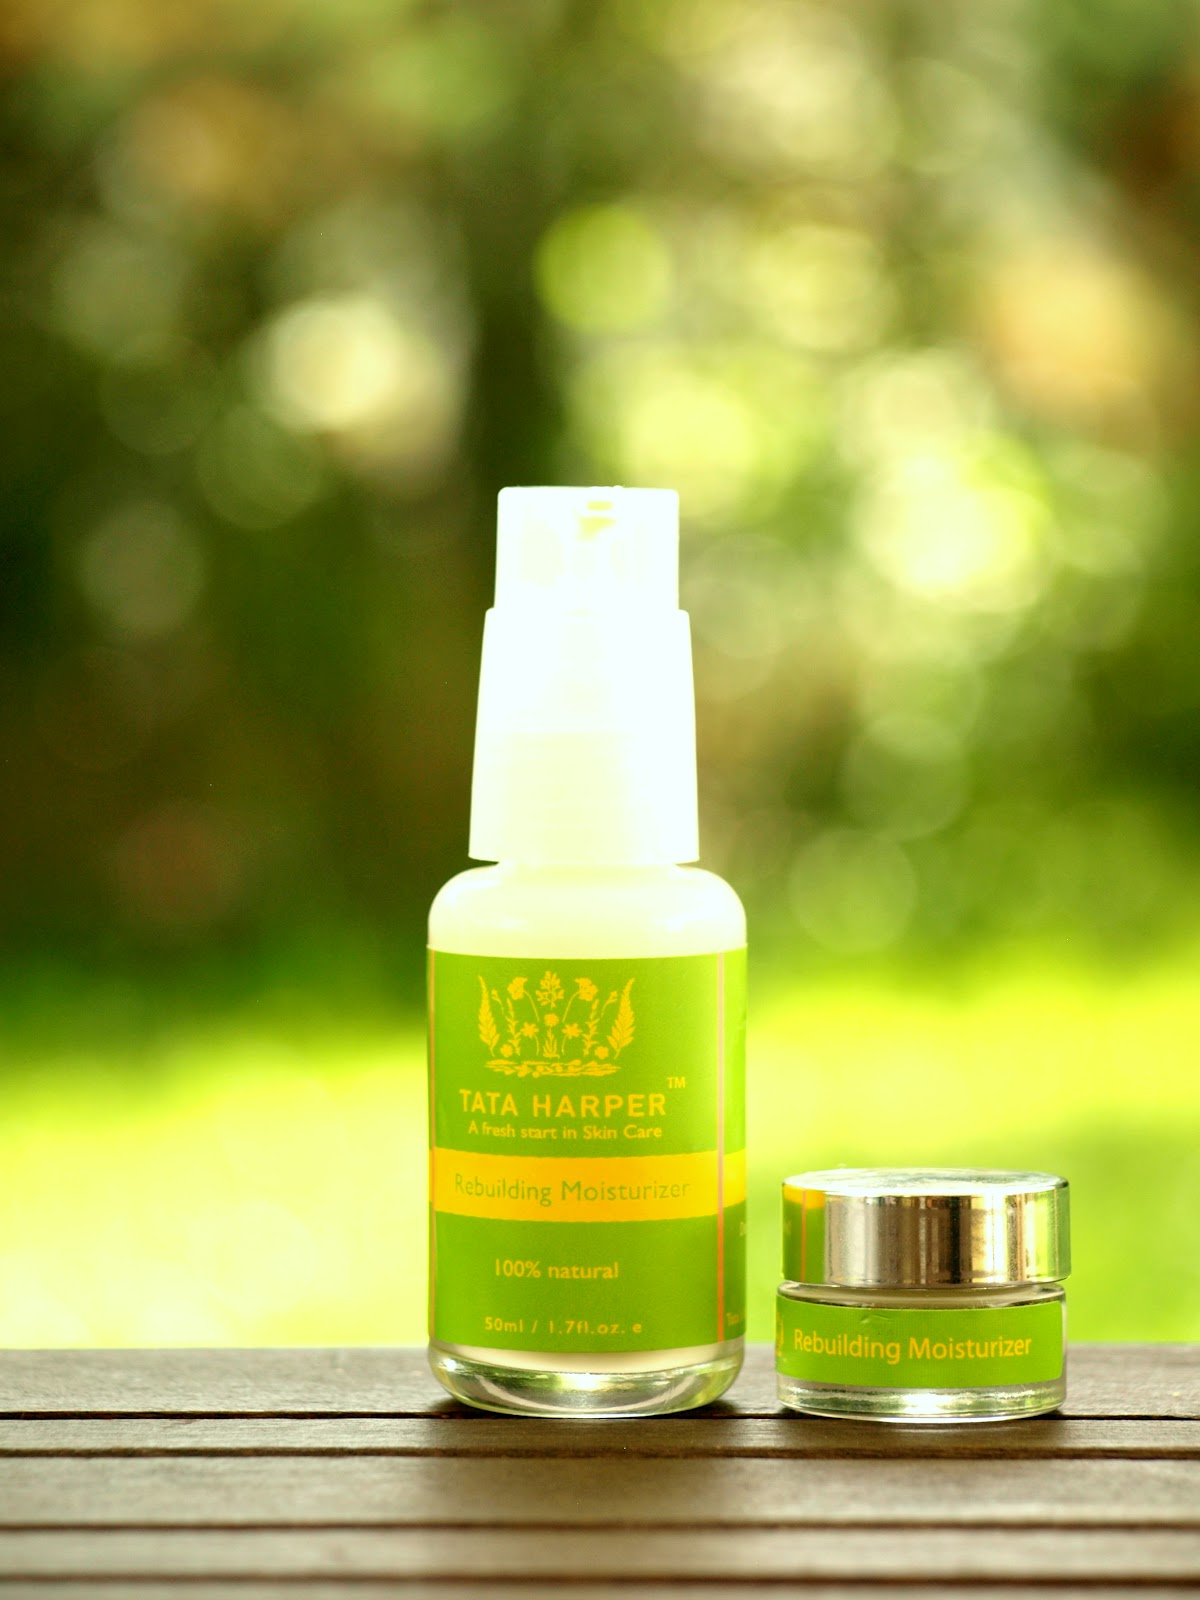 Tata Harper moisterizer, Organic skincare